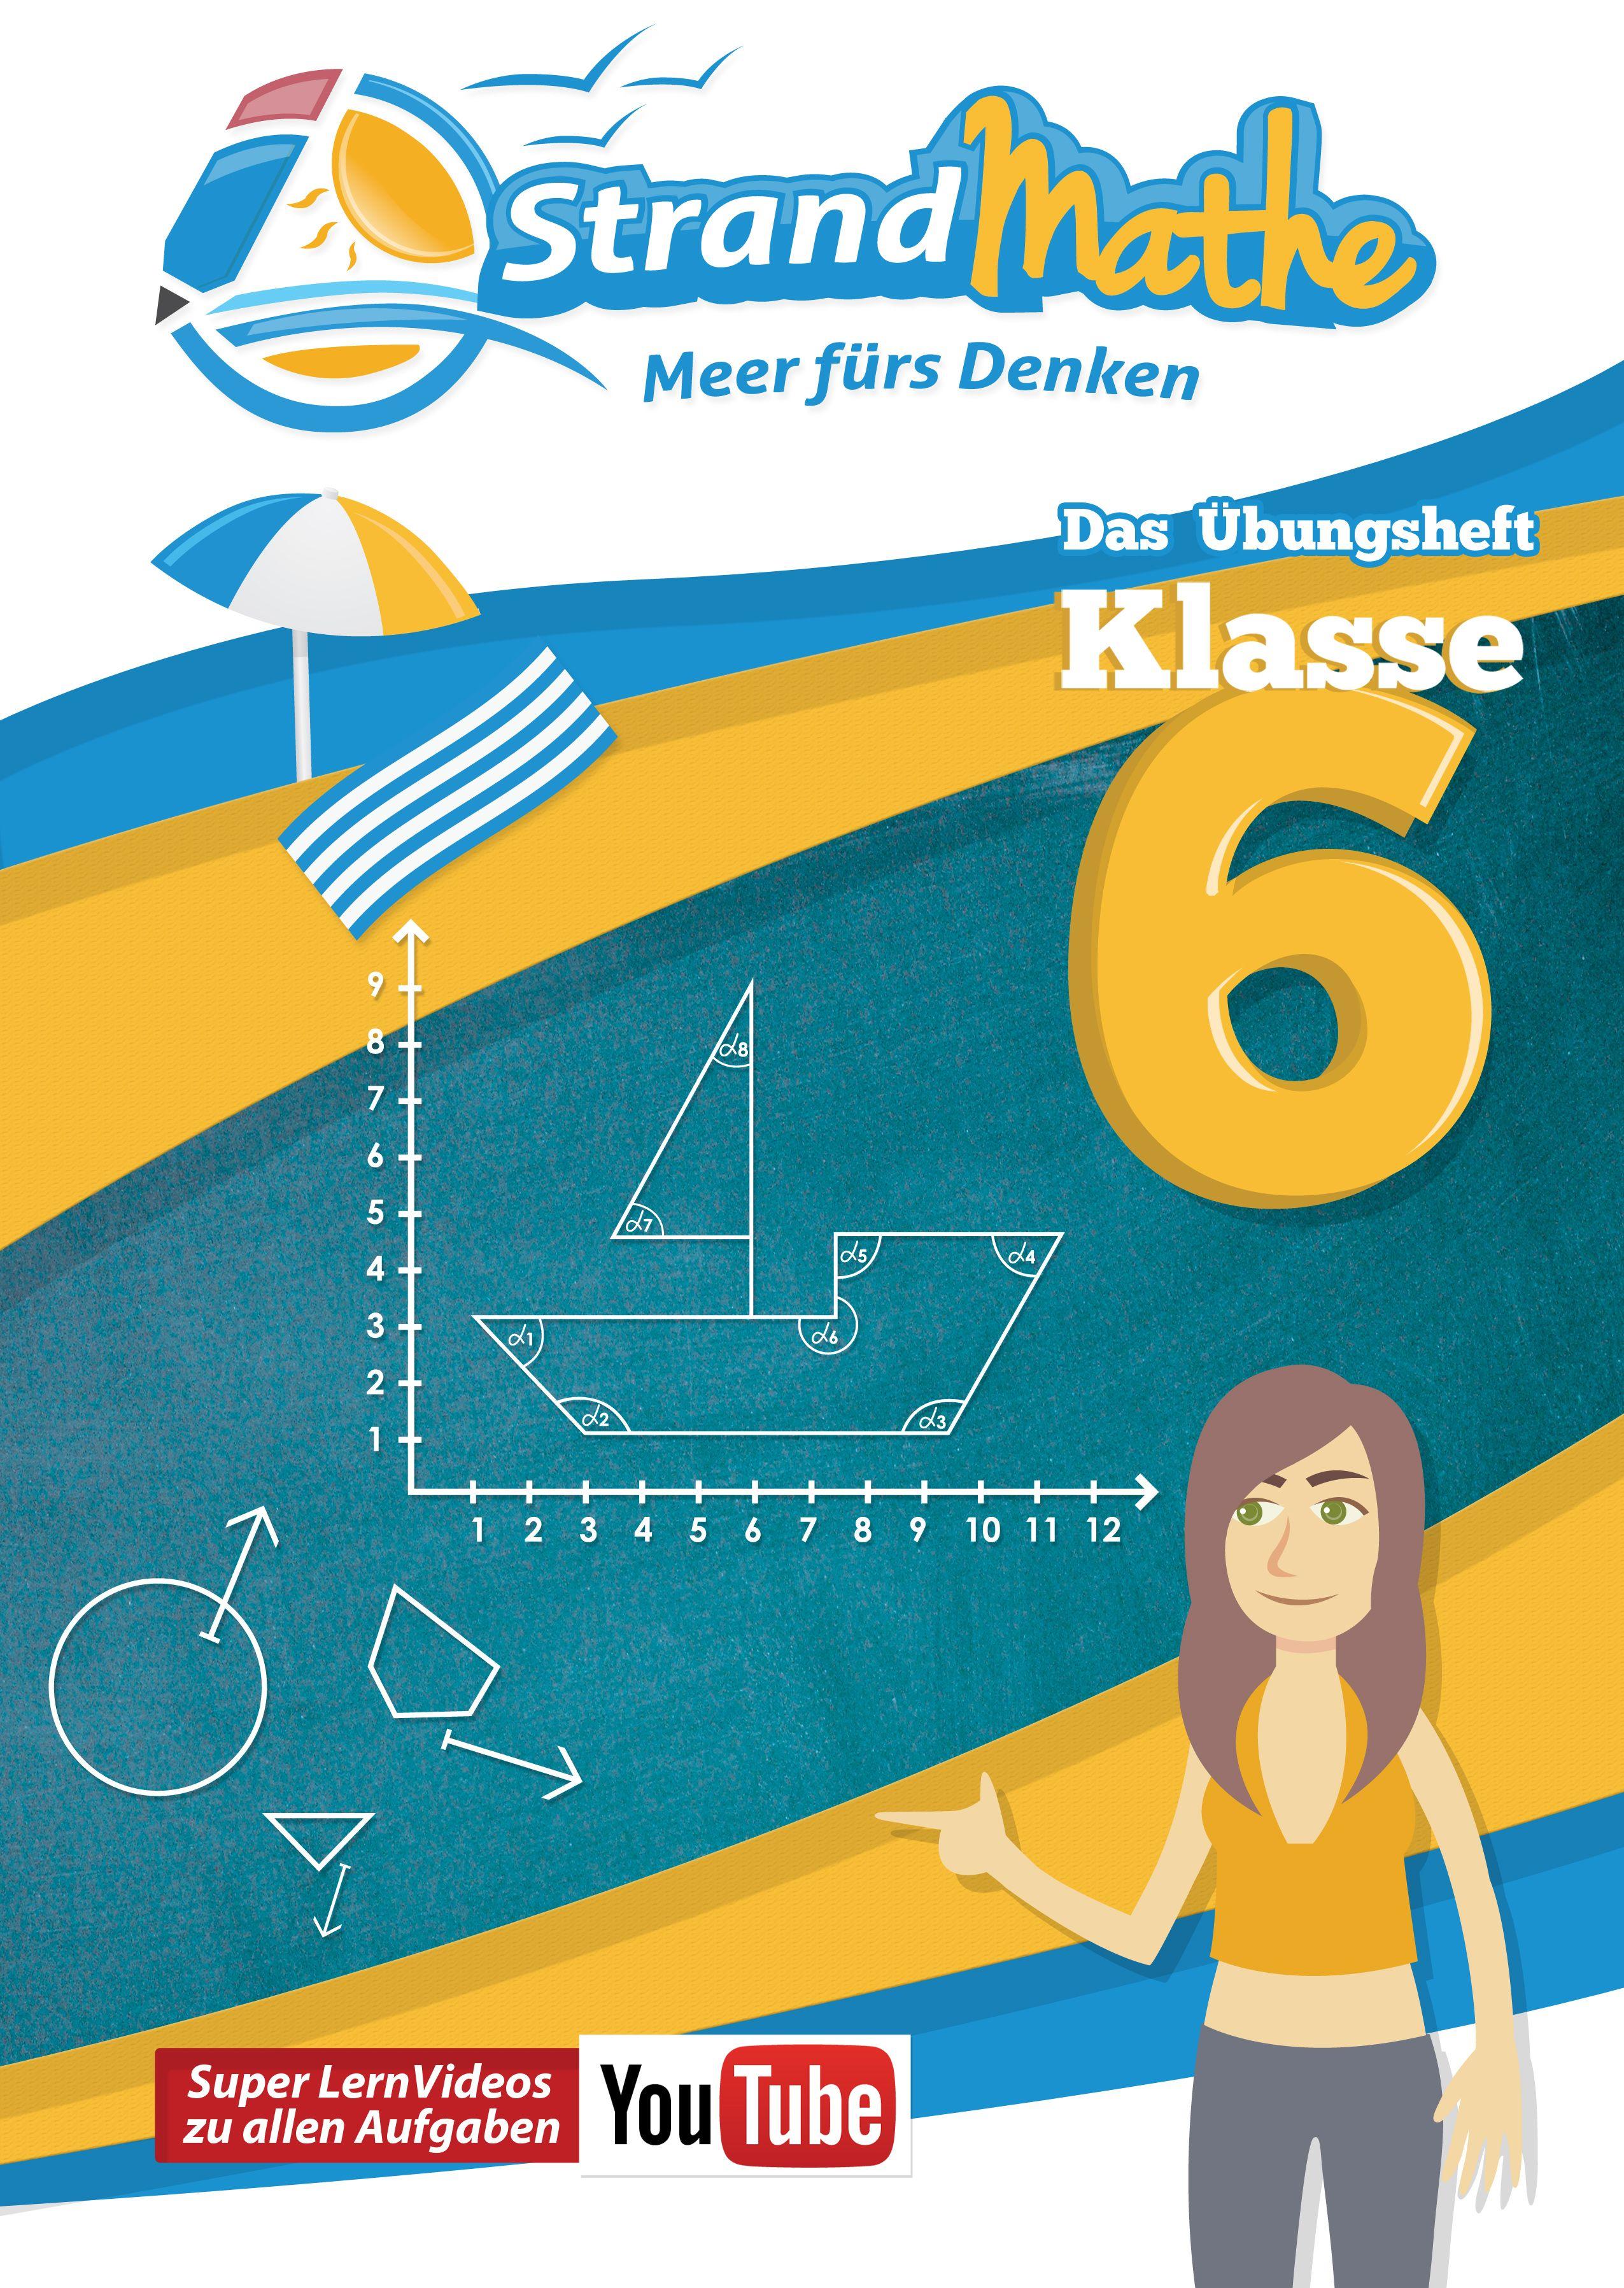 StrandMathe Übungsheft Mathe Klasse 6 – mit kostenlosen Lernvideos